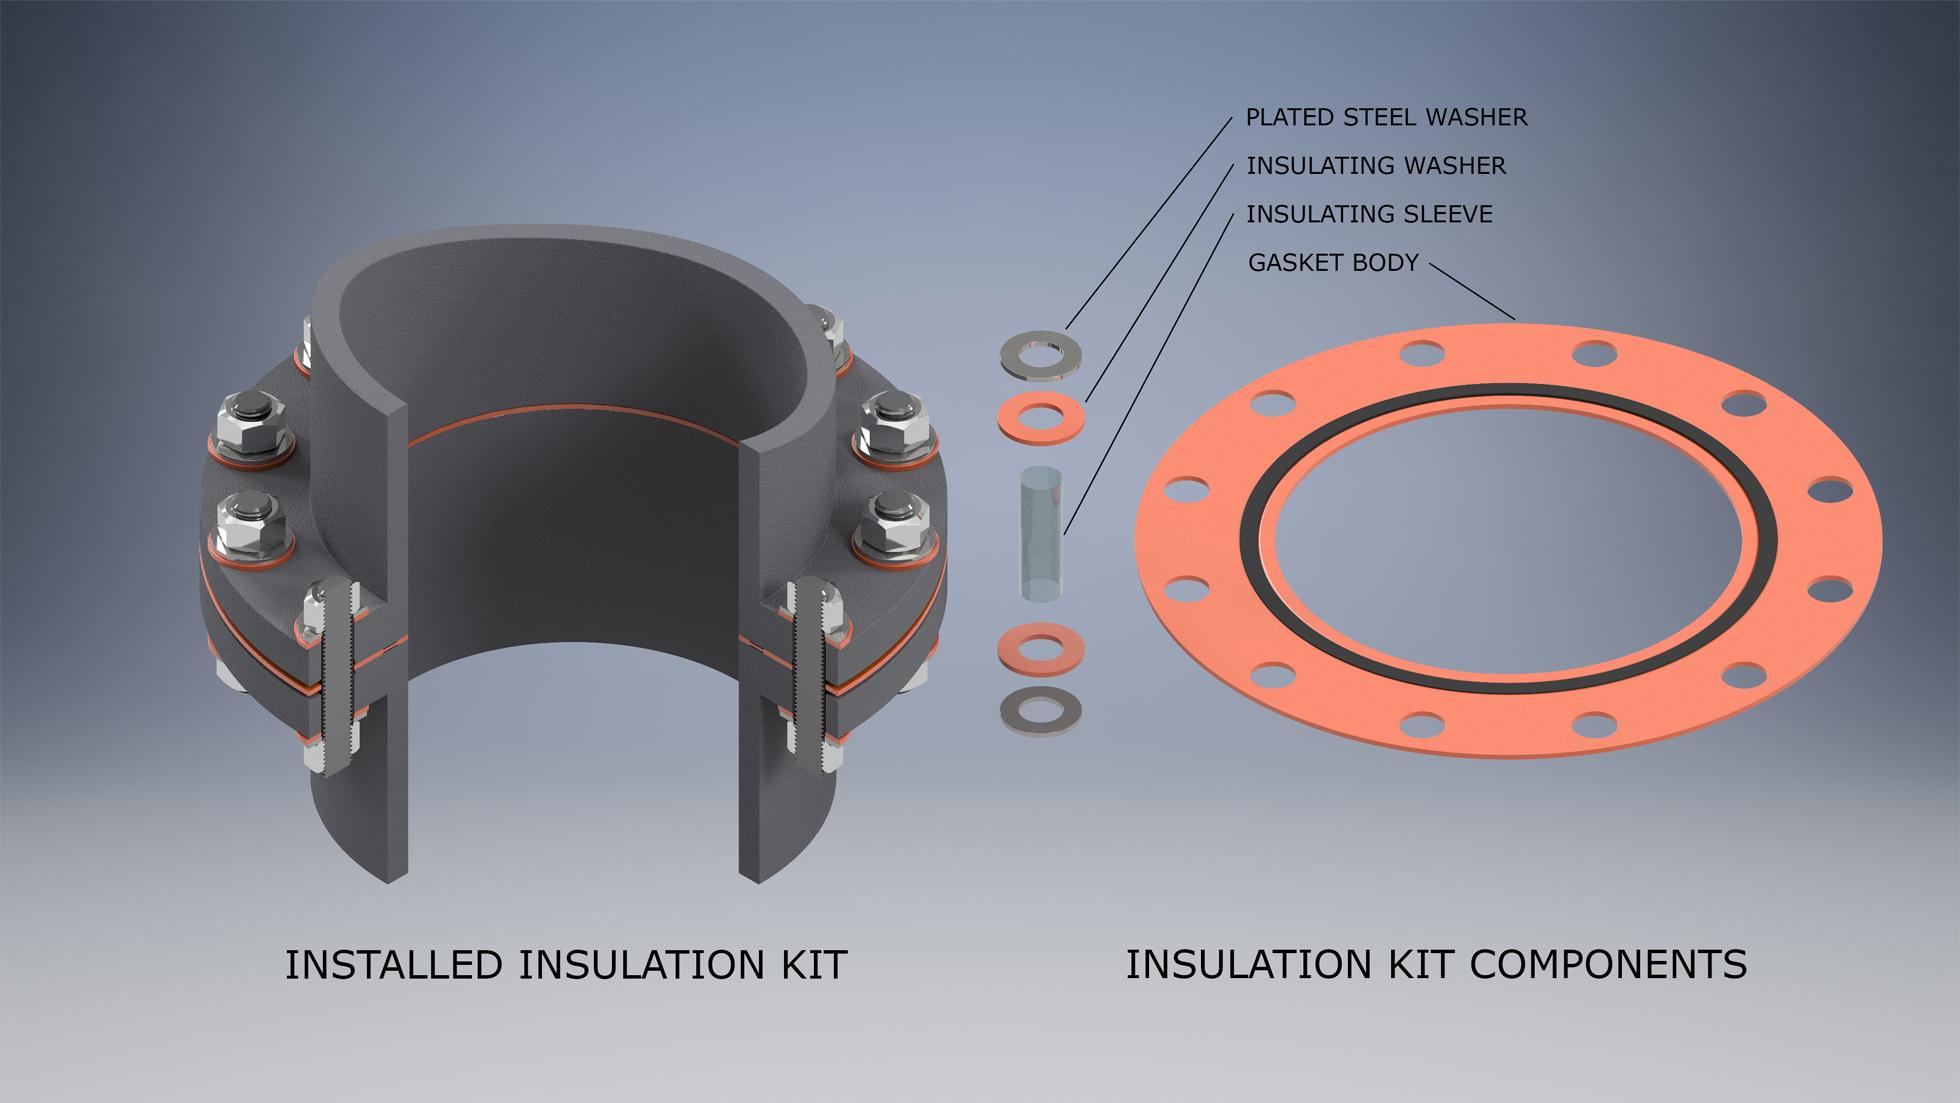 Cathodic Insulation Kits | TXG Industries